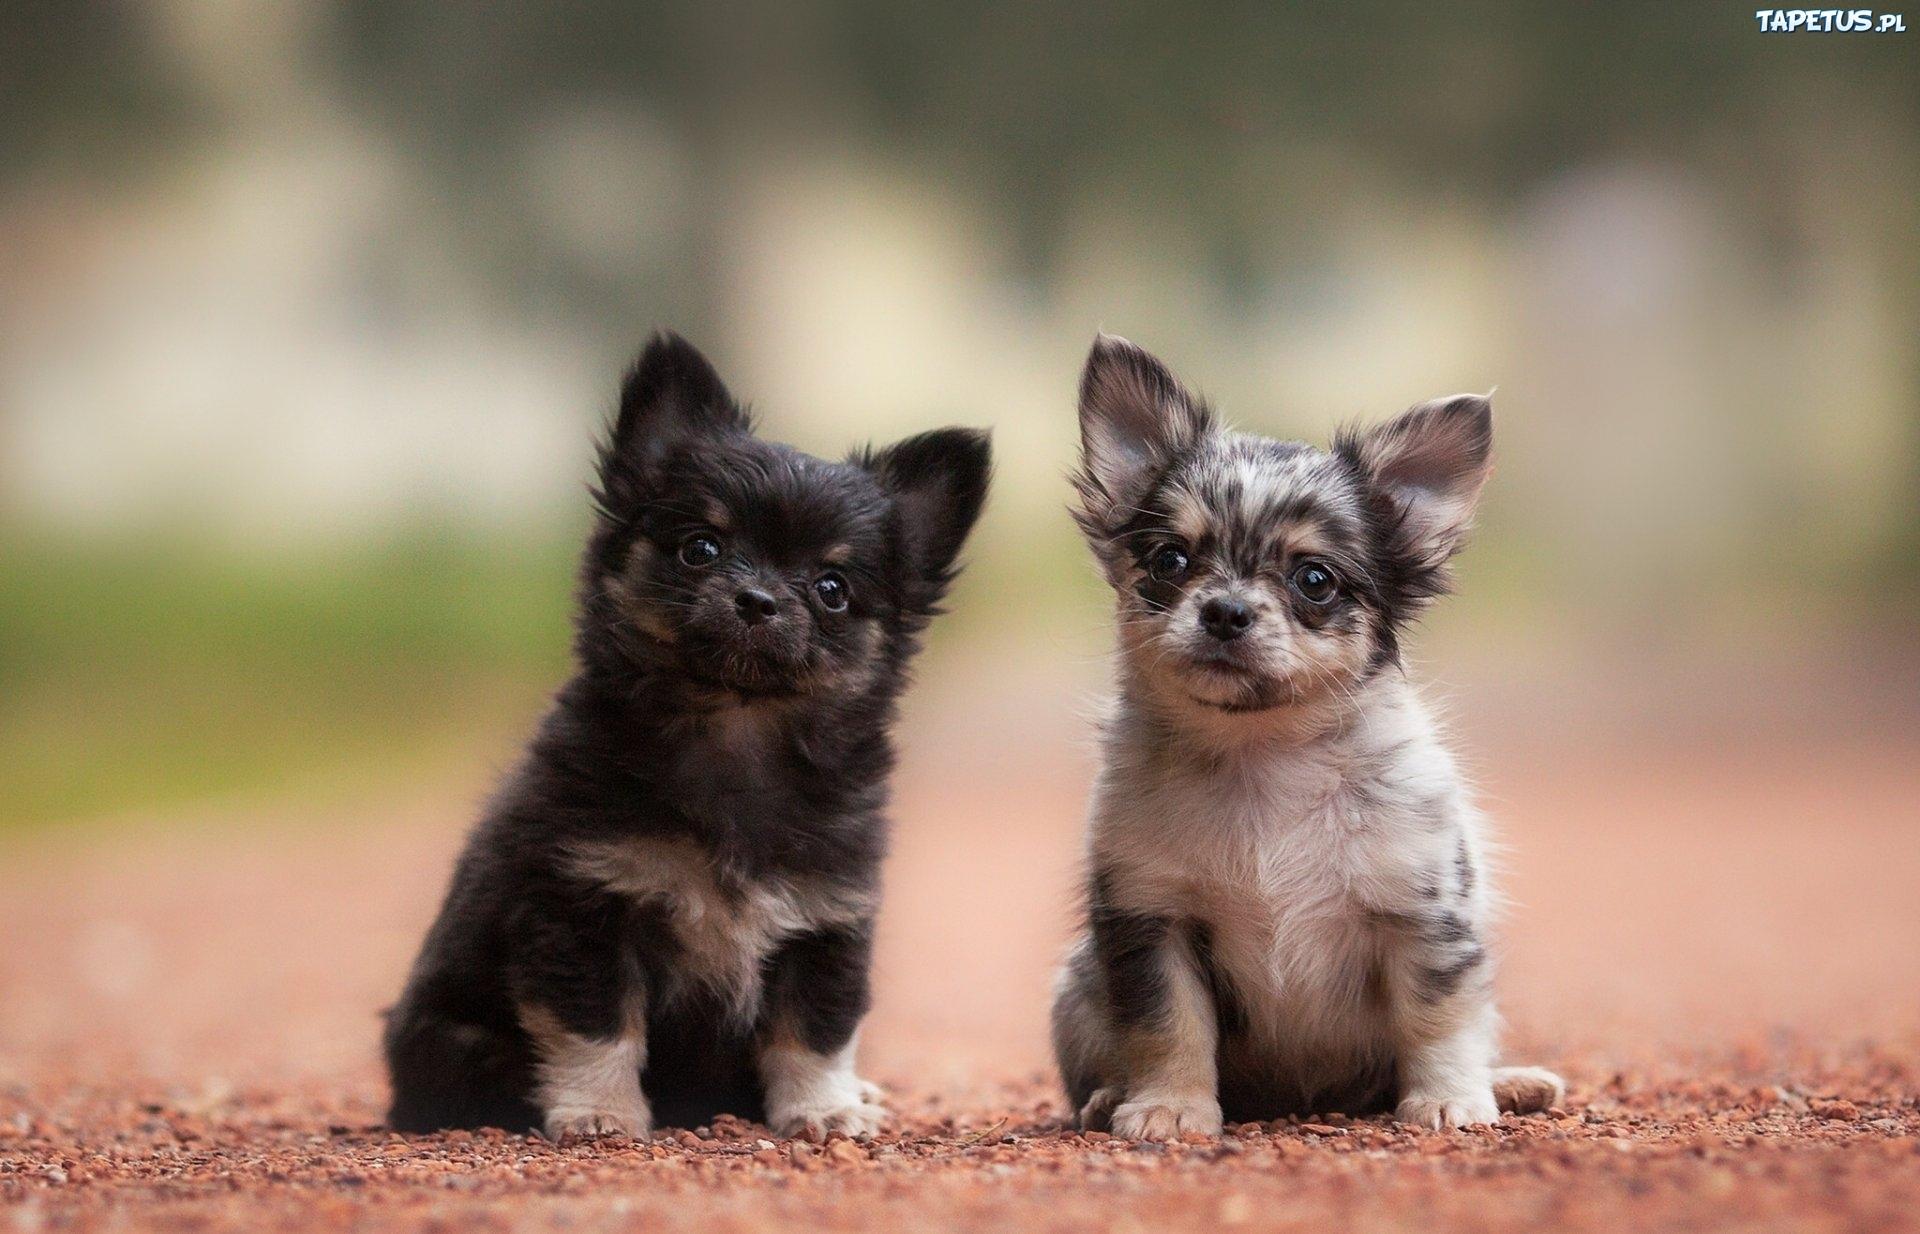 Cute Shih Tzu Puppies Wallpaper Dwa Pieski Szczeniaki